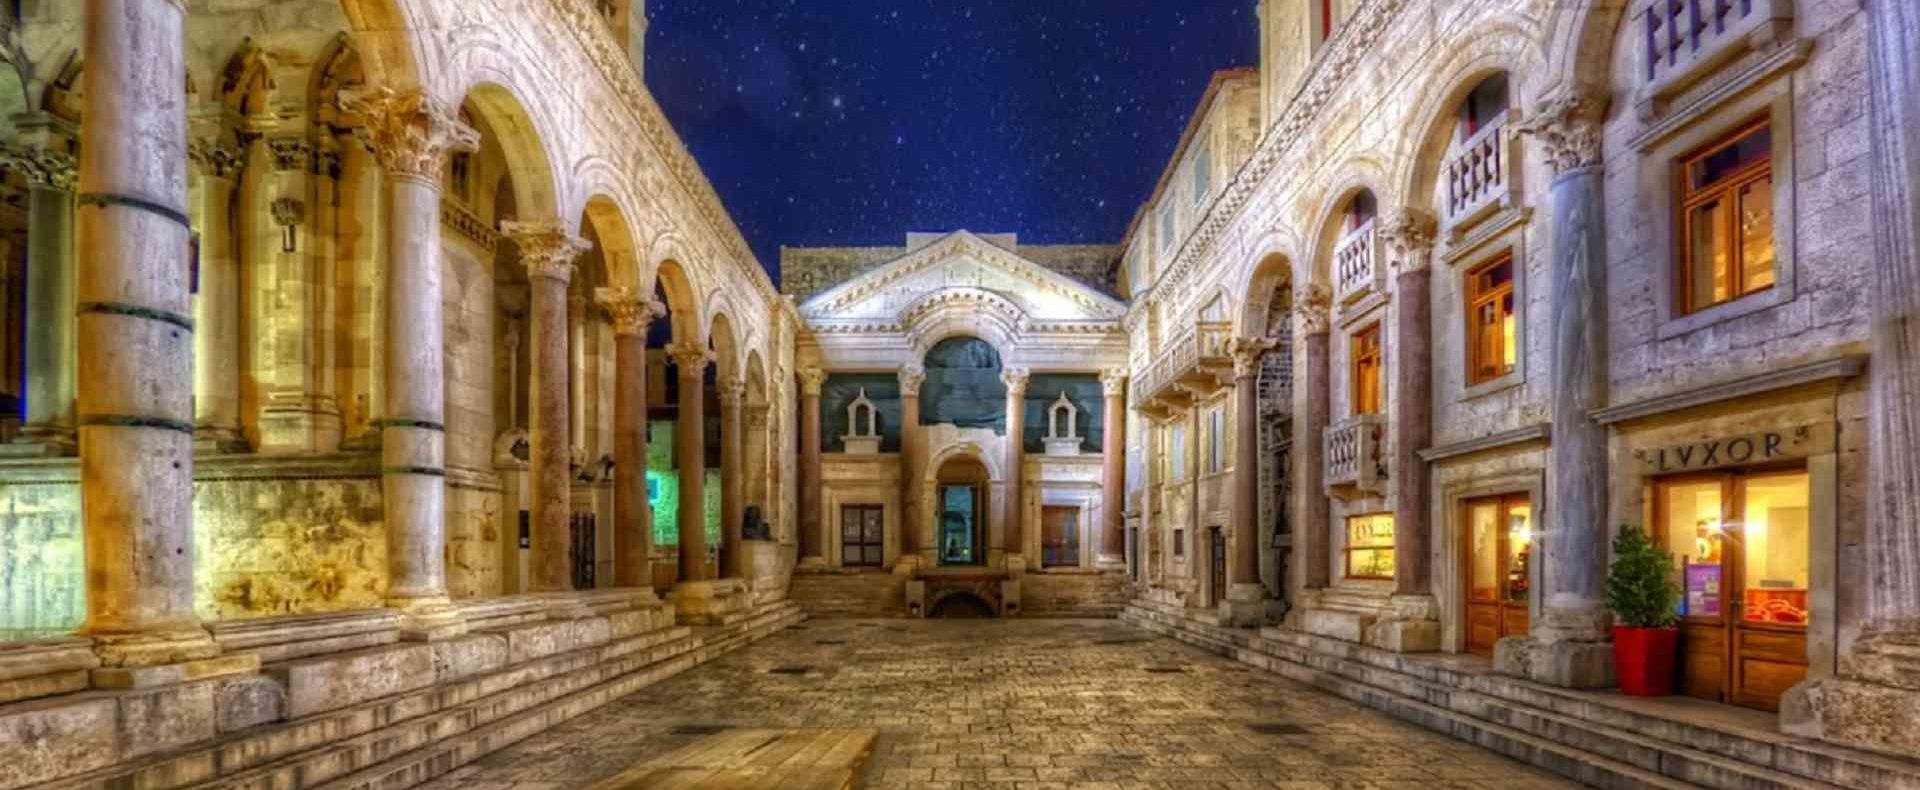 Villas Split Croatia - Diocletian Palace